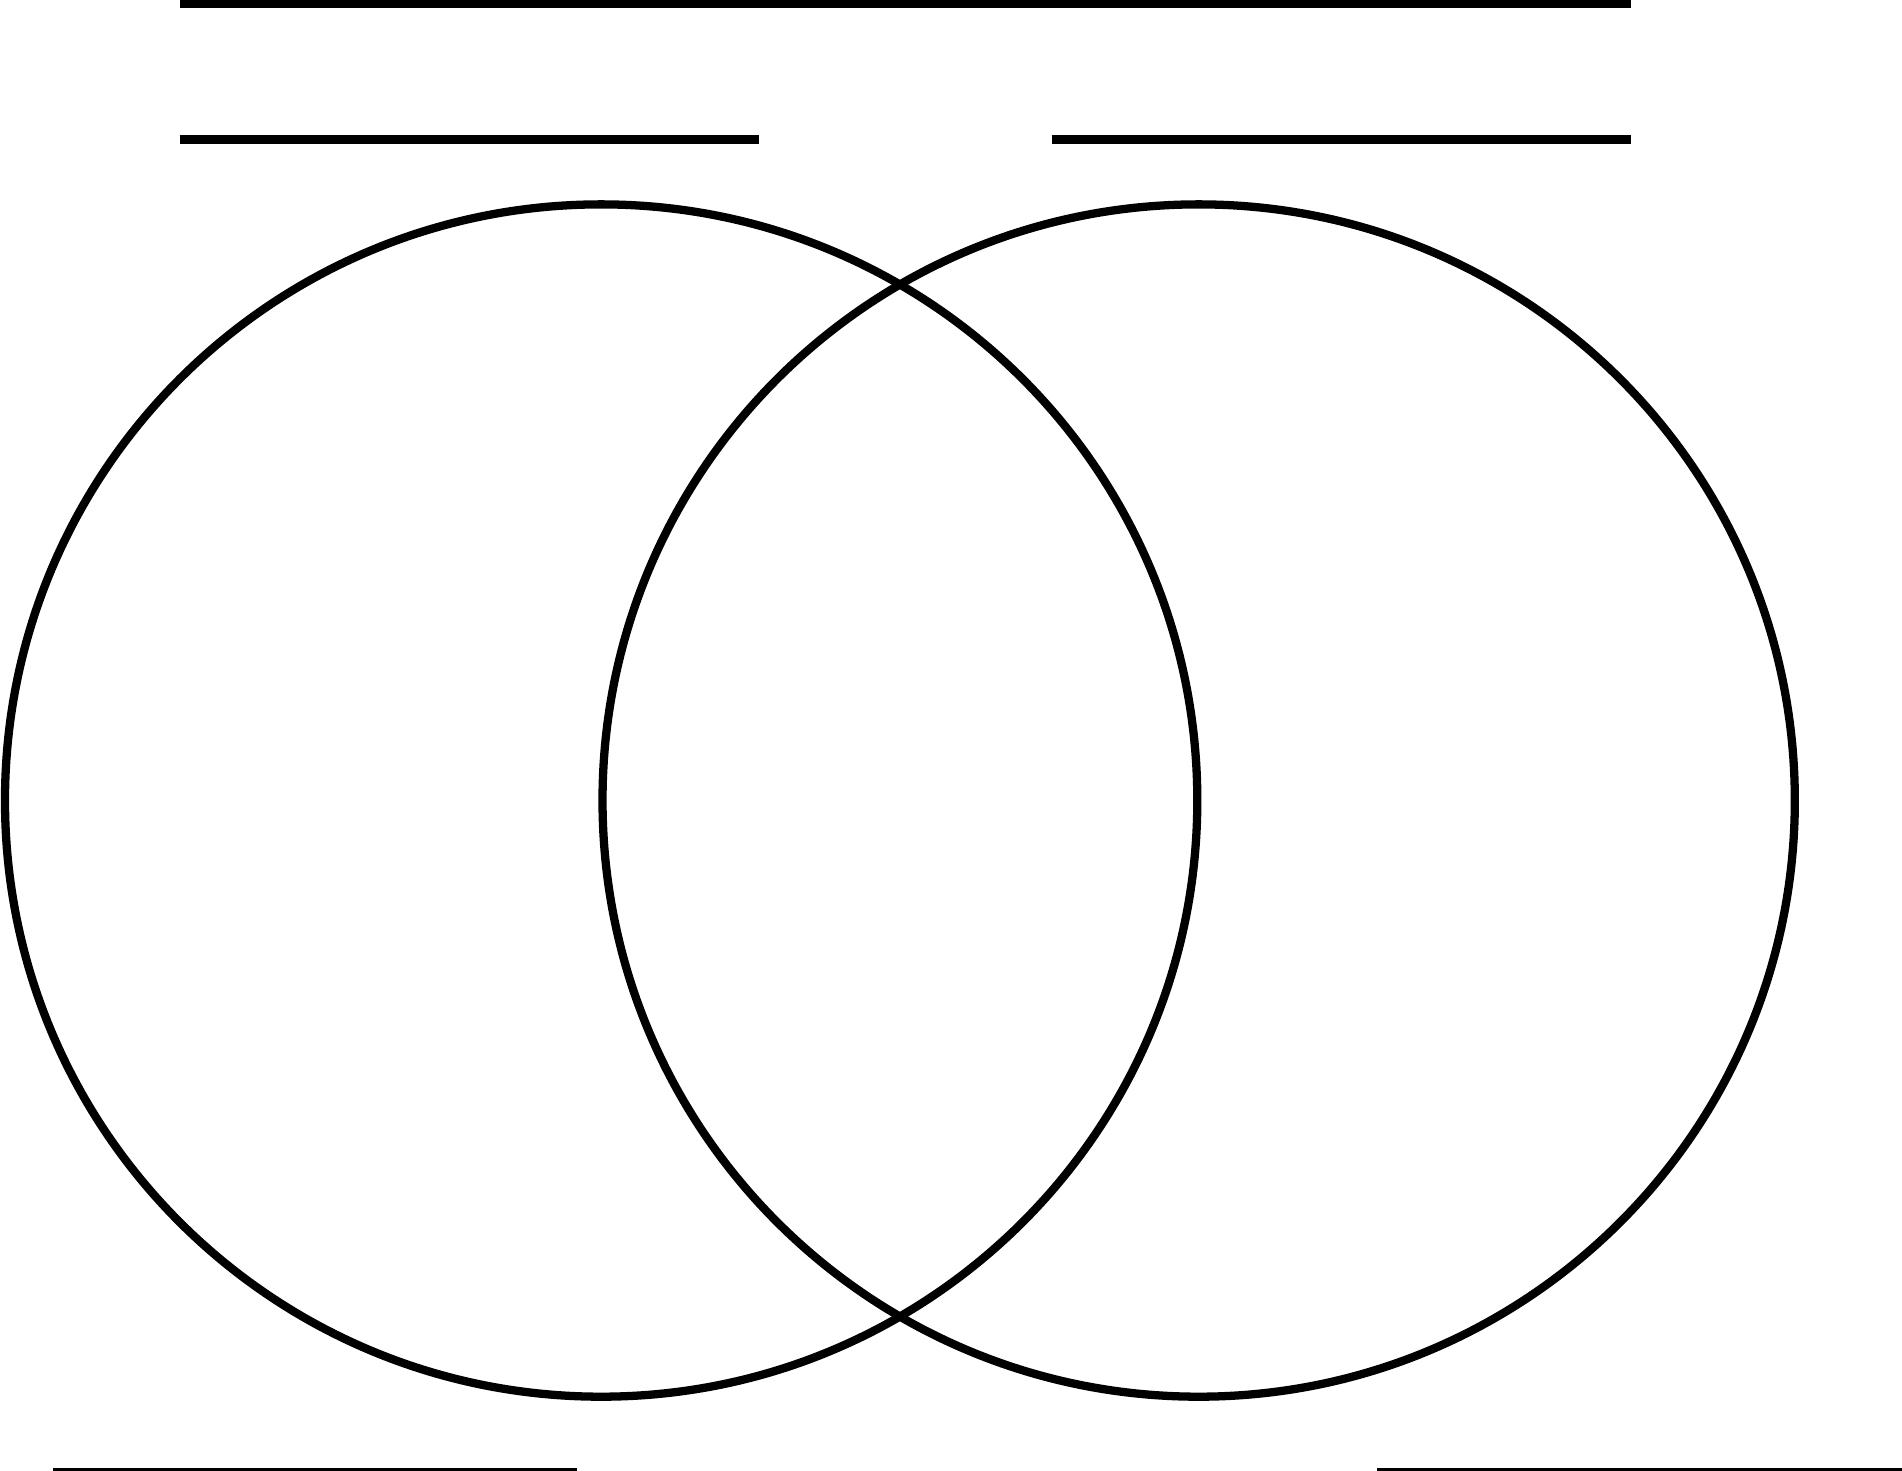 Venn Diagram Template Venn Diagram With Lines Template Pdf Erhayasamayolver